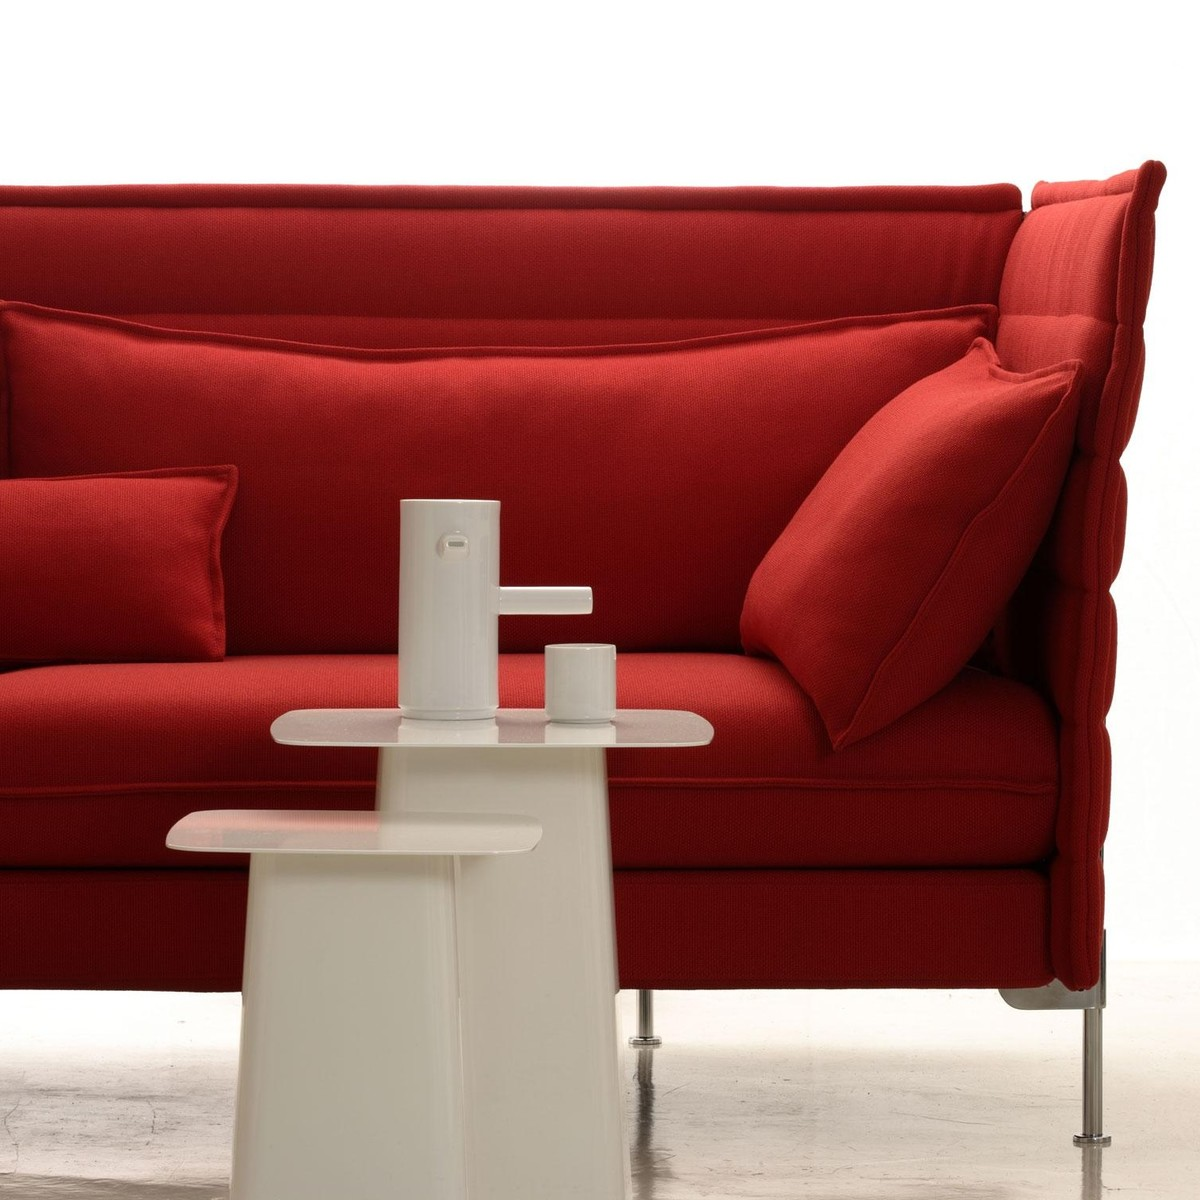 alcove bouroullec 3 sitzer sofa vitra. Black Bedroom Furniture Sets. Home Design Ideas